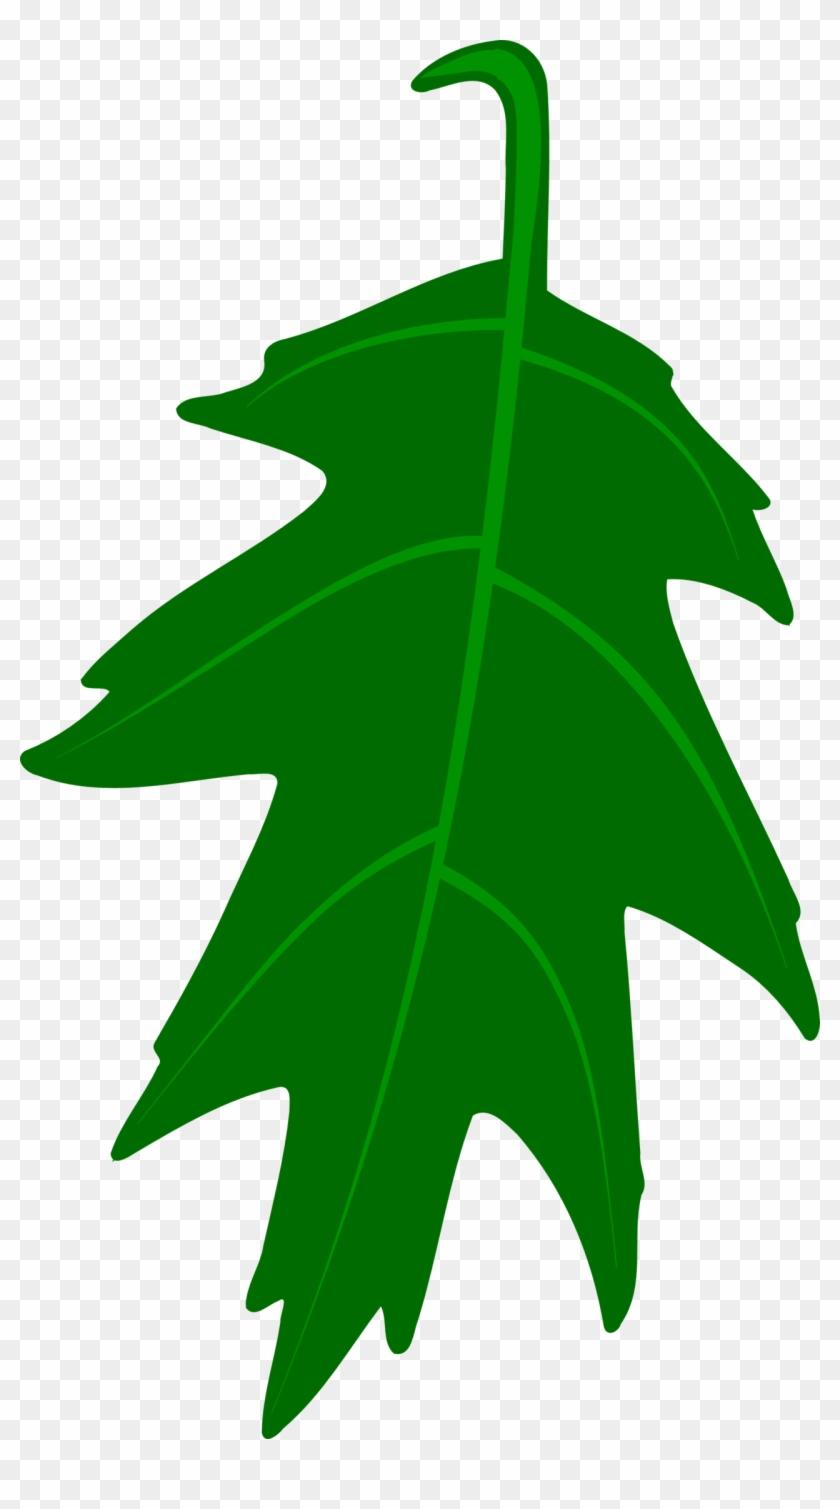 Ivy Clipart Big Leaf - Green Oak Leaf Clip Art #23055